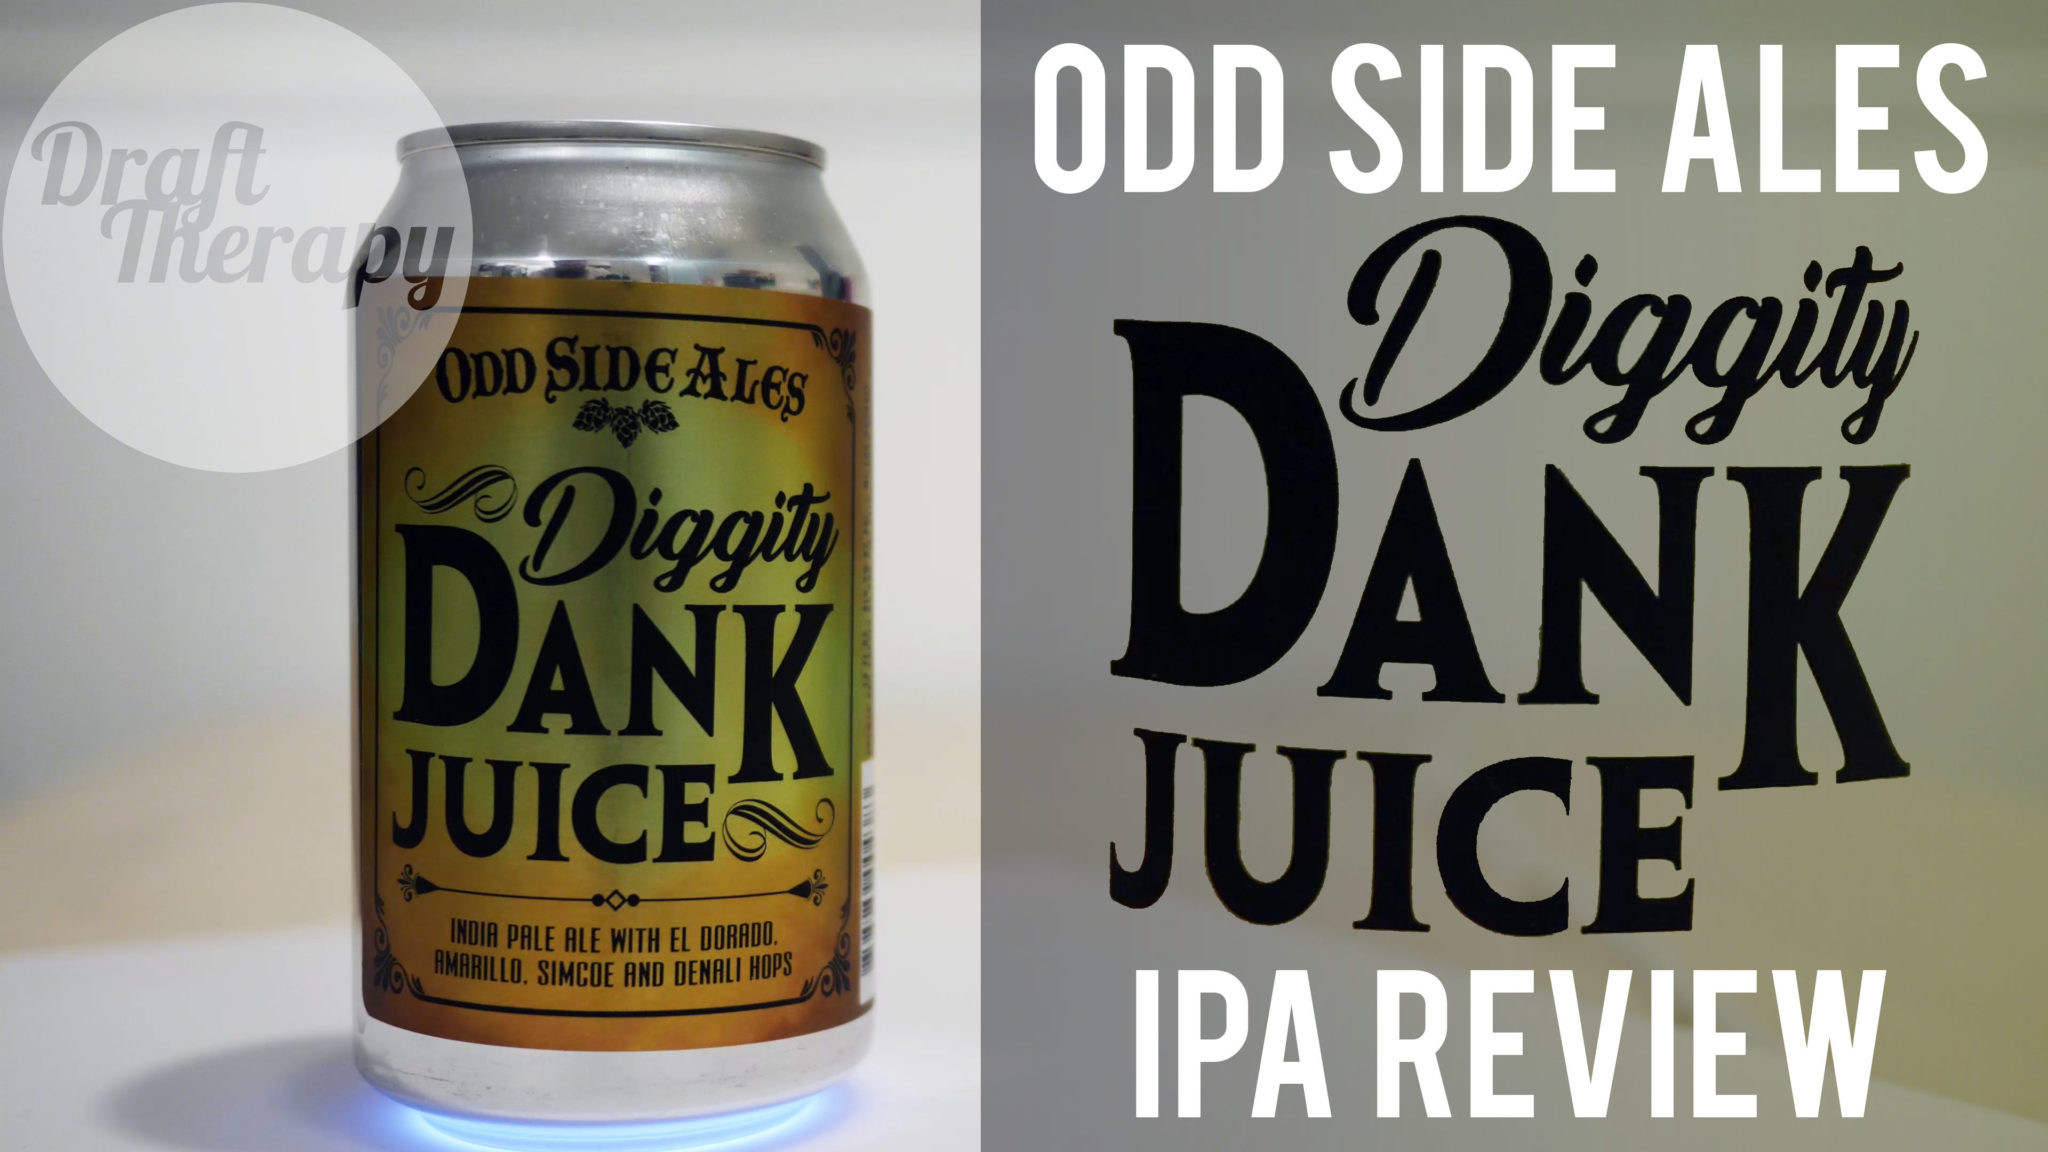 Odd Side Ales – Diggity Dank Juice – A Dank Juice Masterpiece?